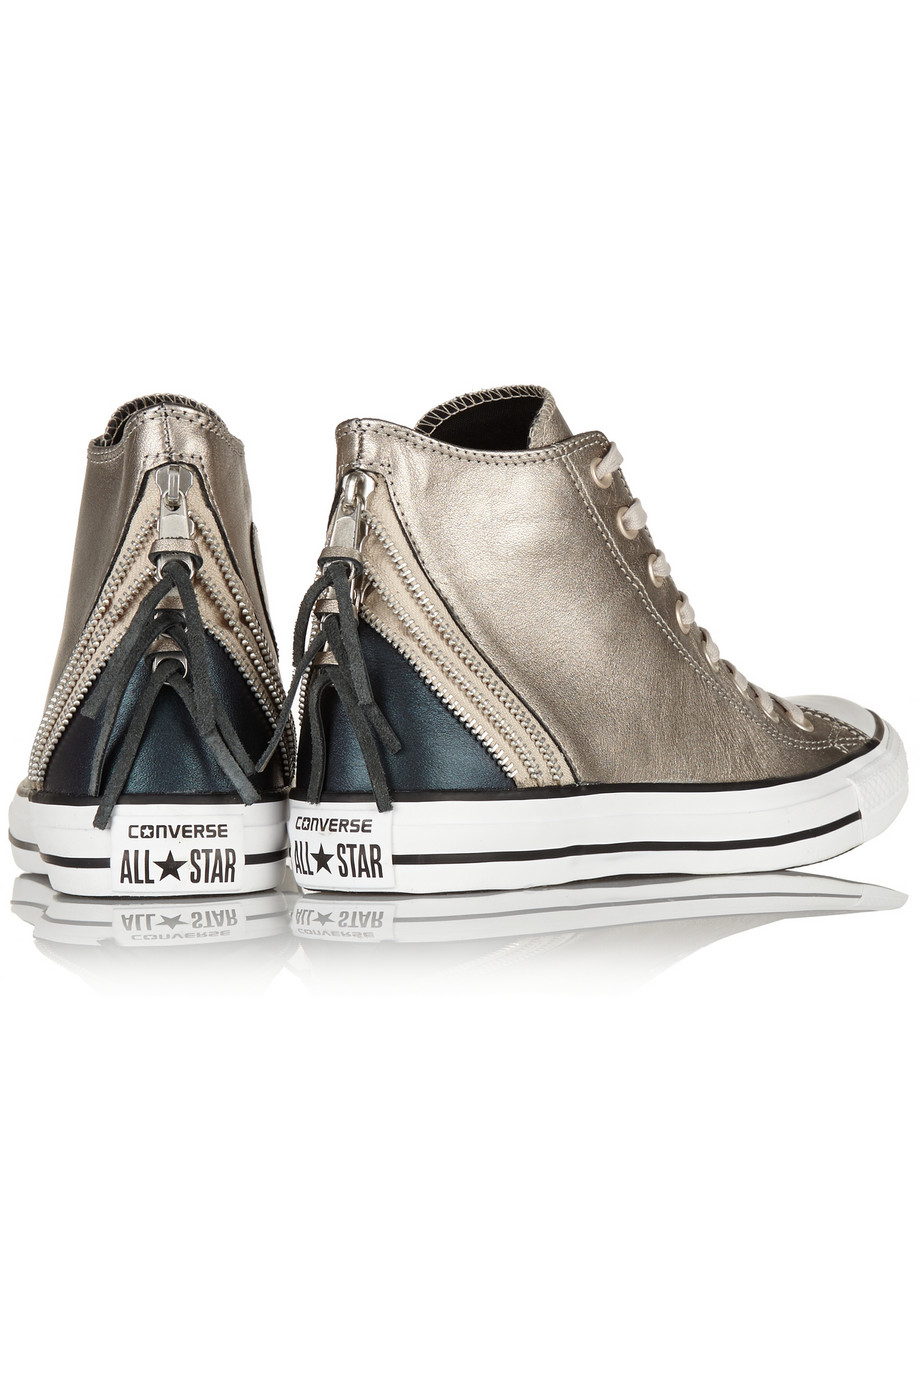 Converse Chuck Taylor All Star Metallic High-Top Women's Casual Shoes Bronze